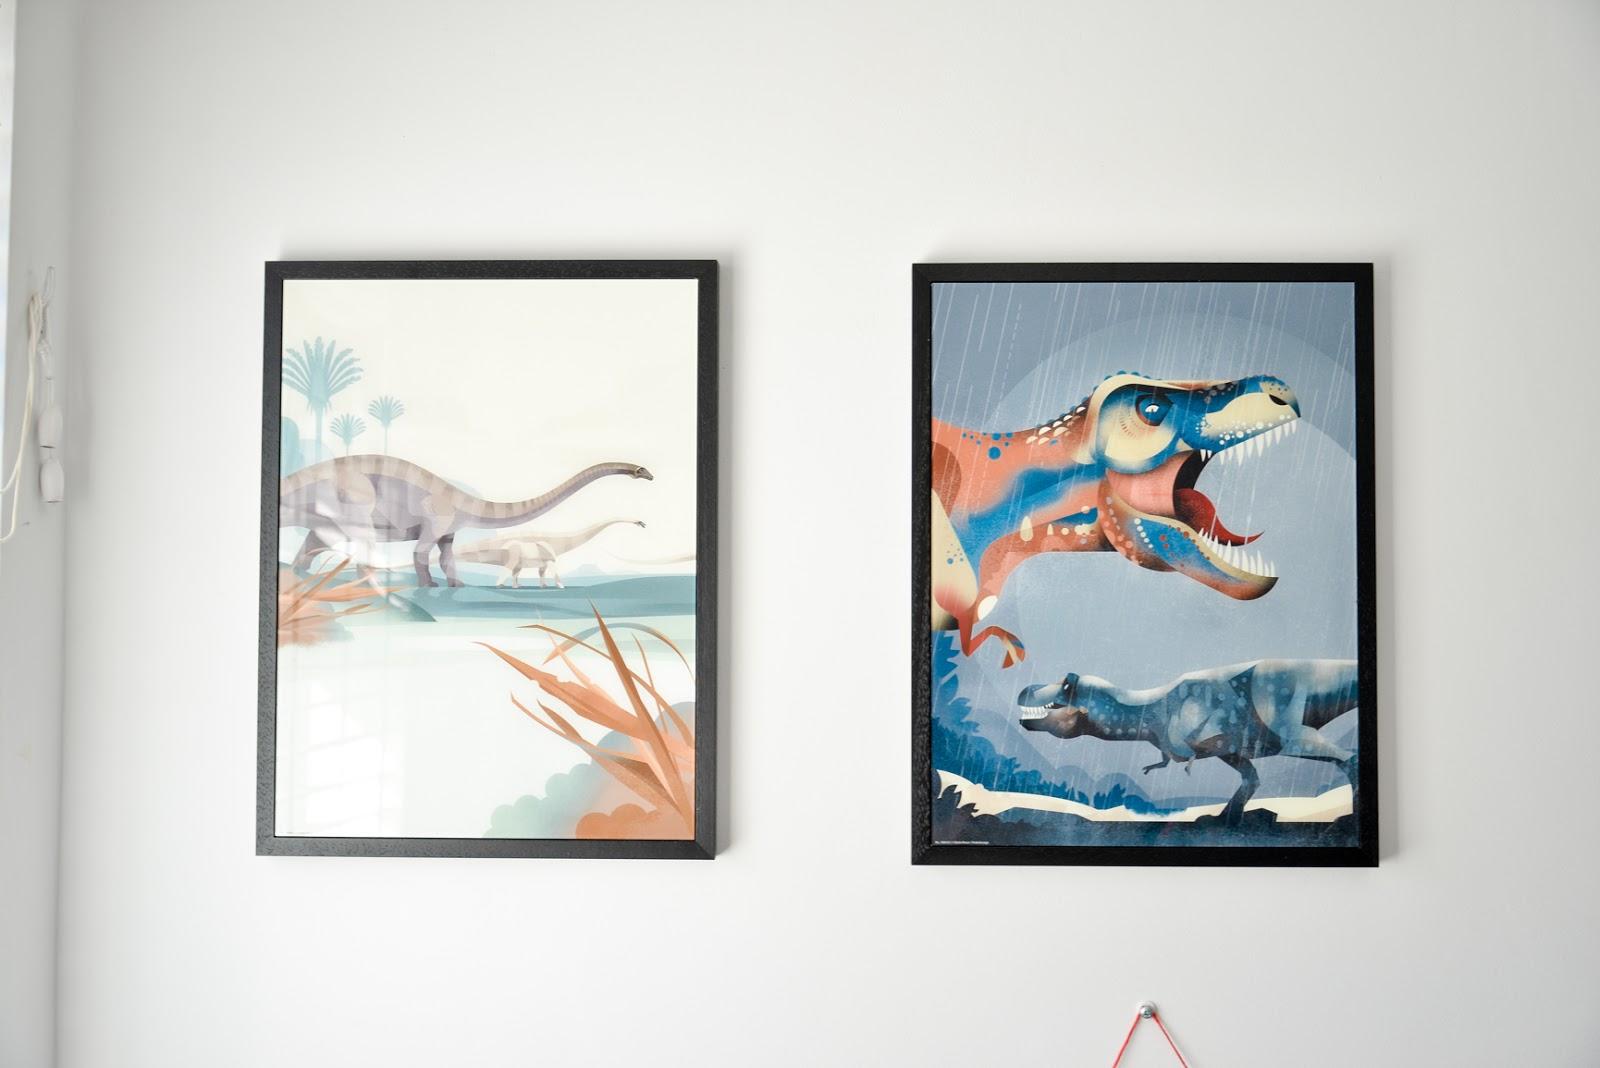 dinosaur frames, dinosaur posters, dinosaur prints,